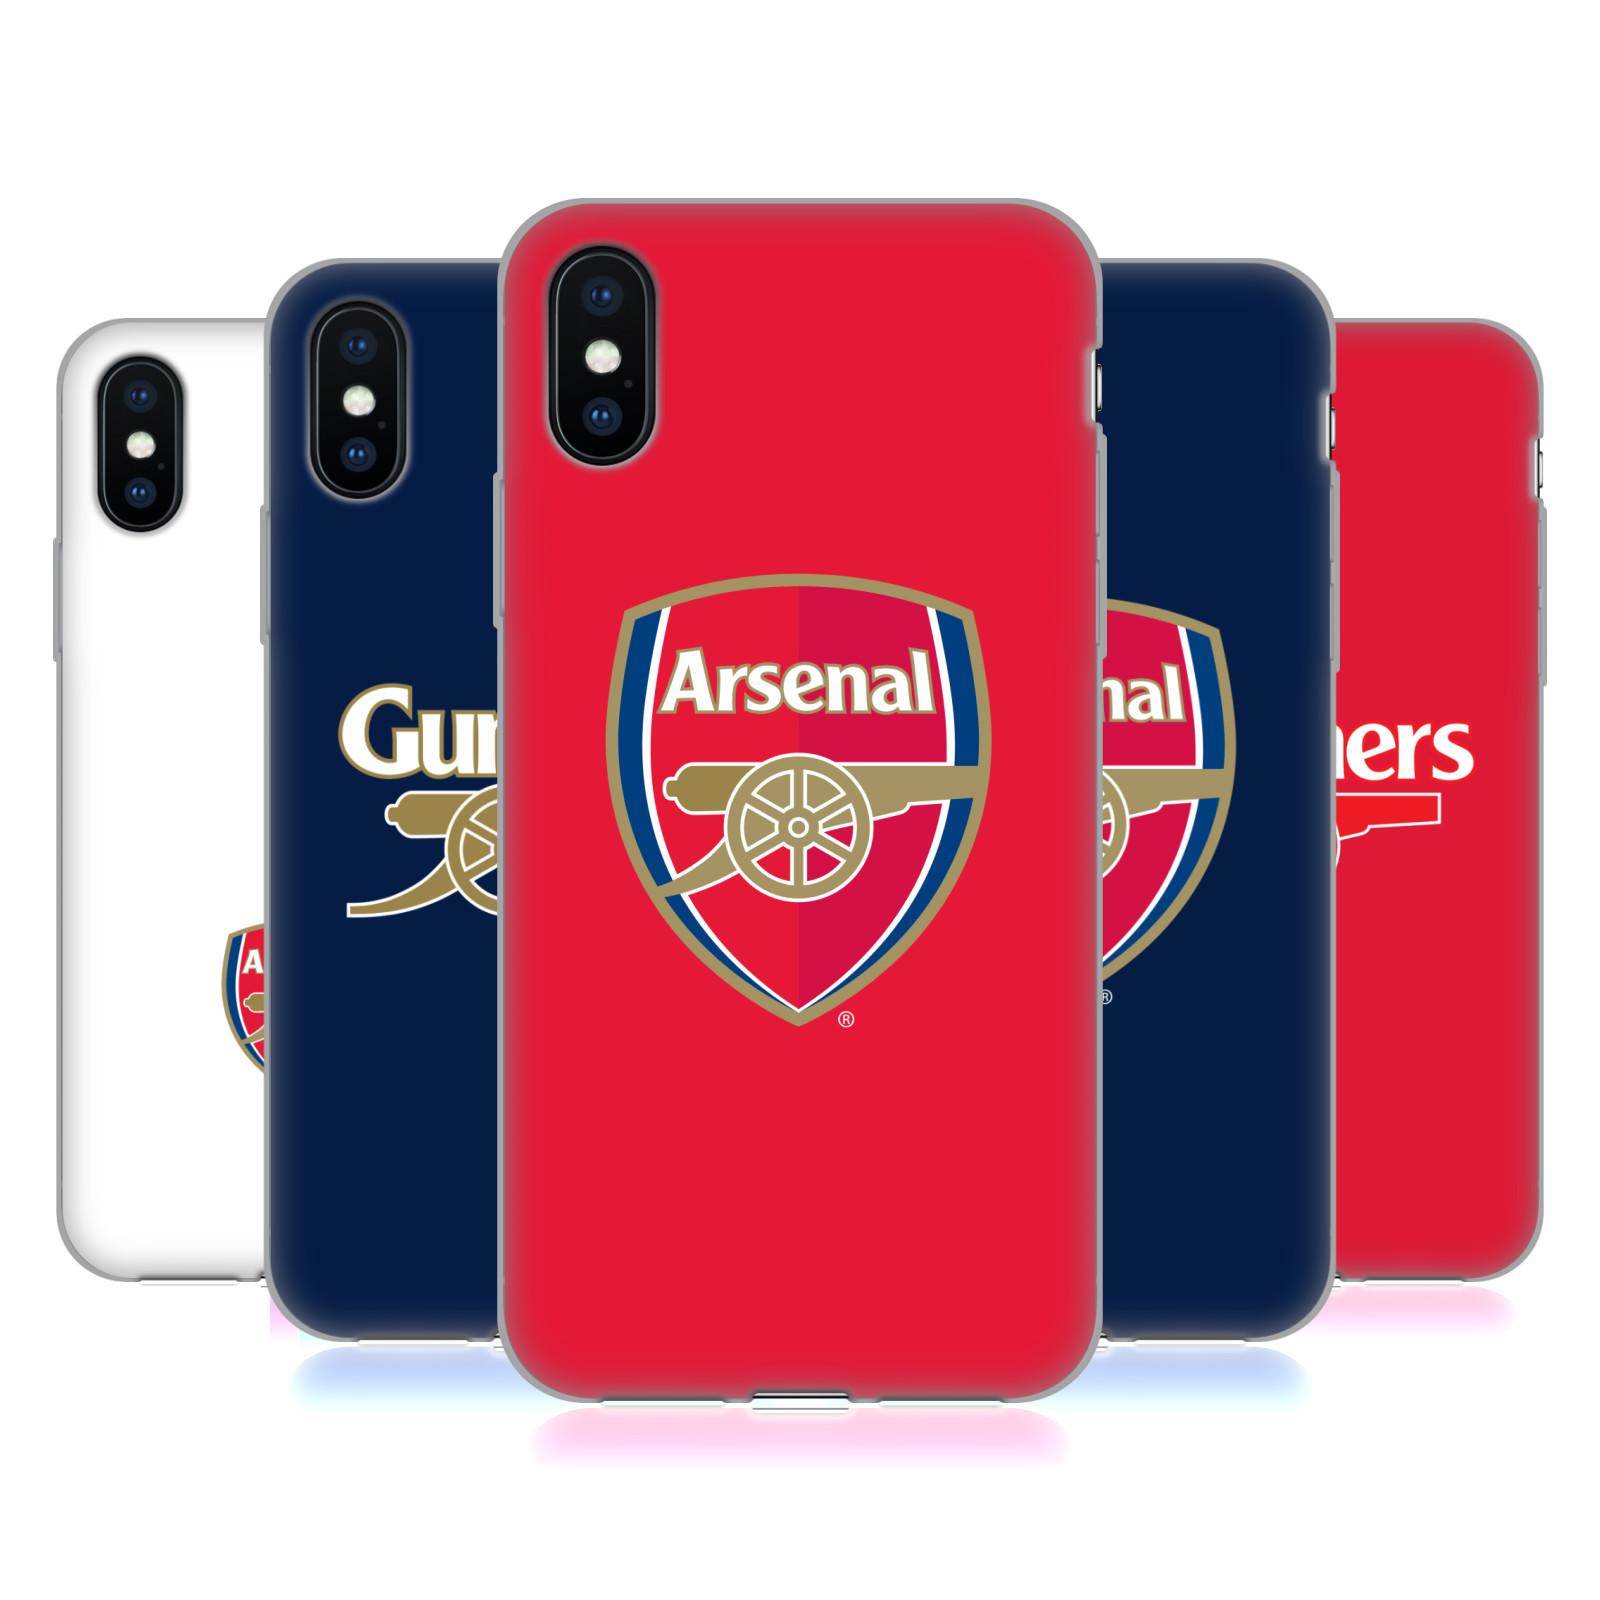 Arsenal FC 2016/17 Crest